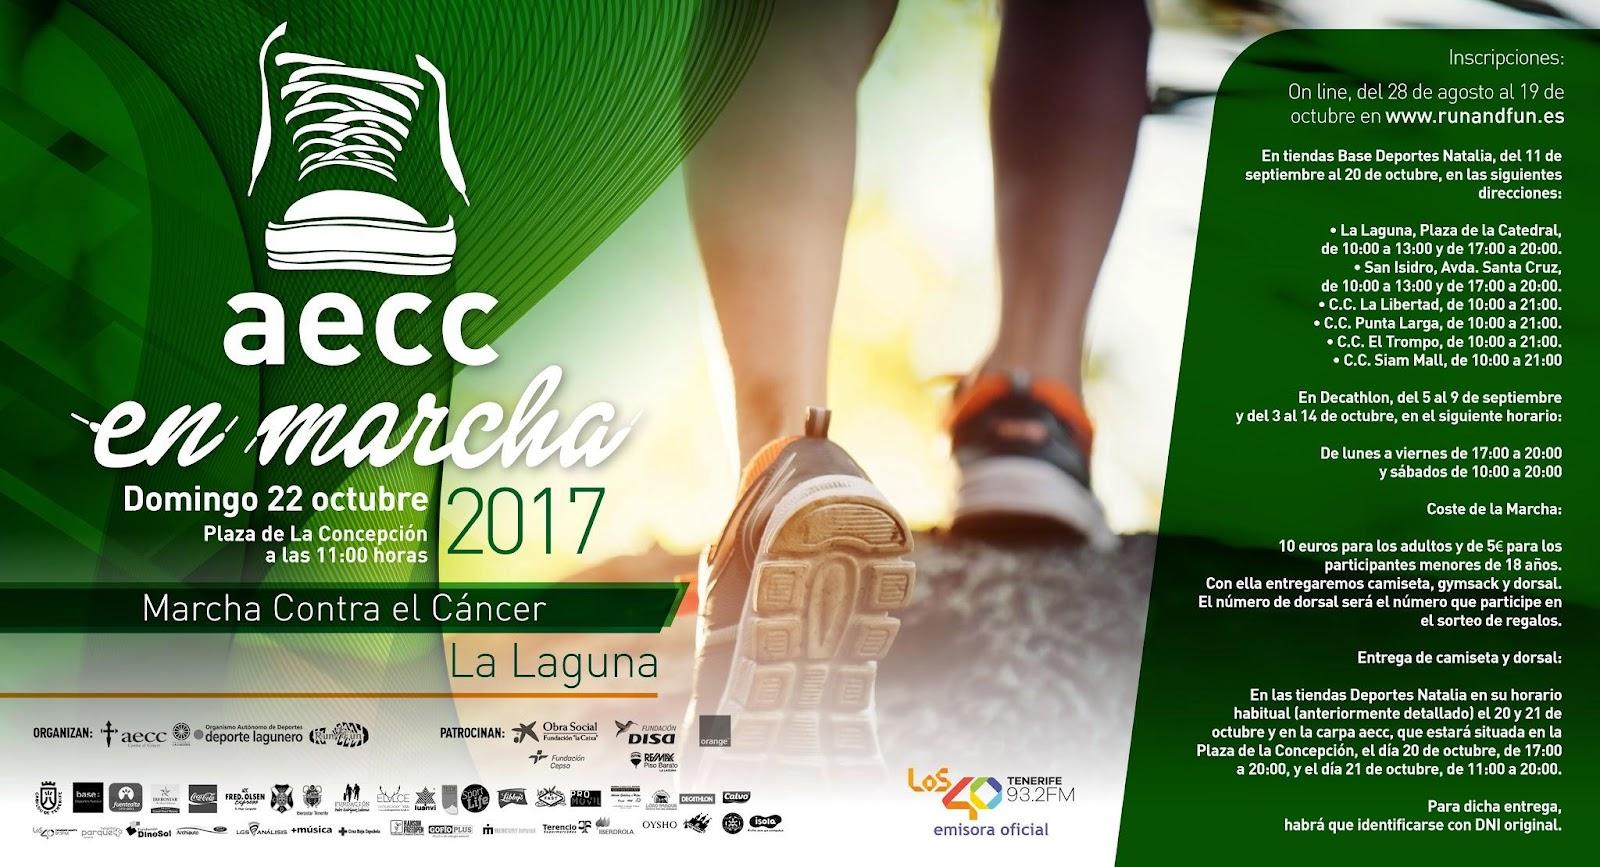 Cartel AECC-en marcha 2017 La Laguna-03.jpg